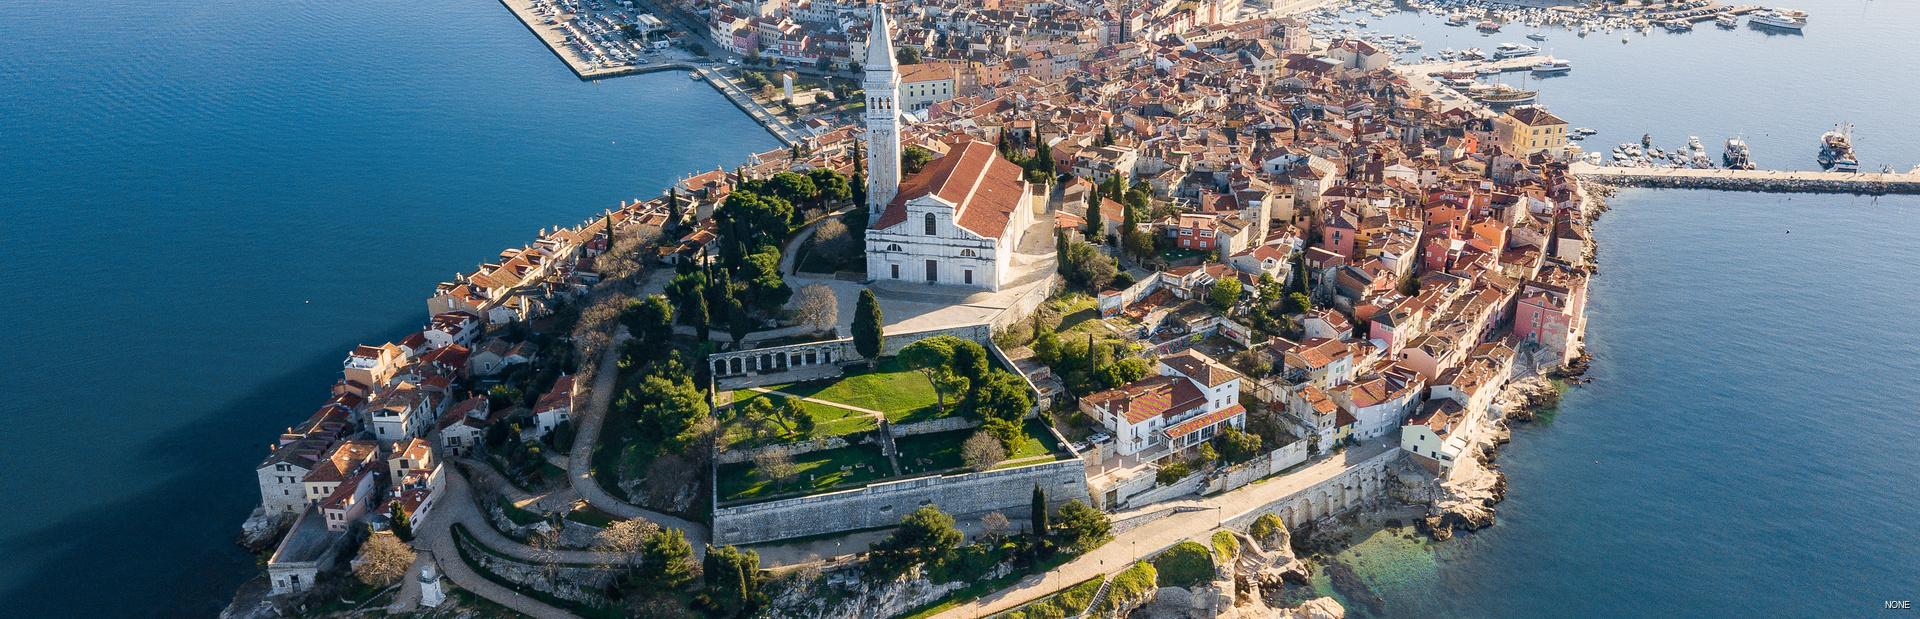 Explore the corners of Rovinj